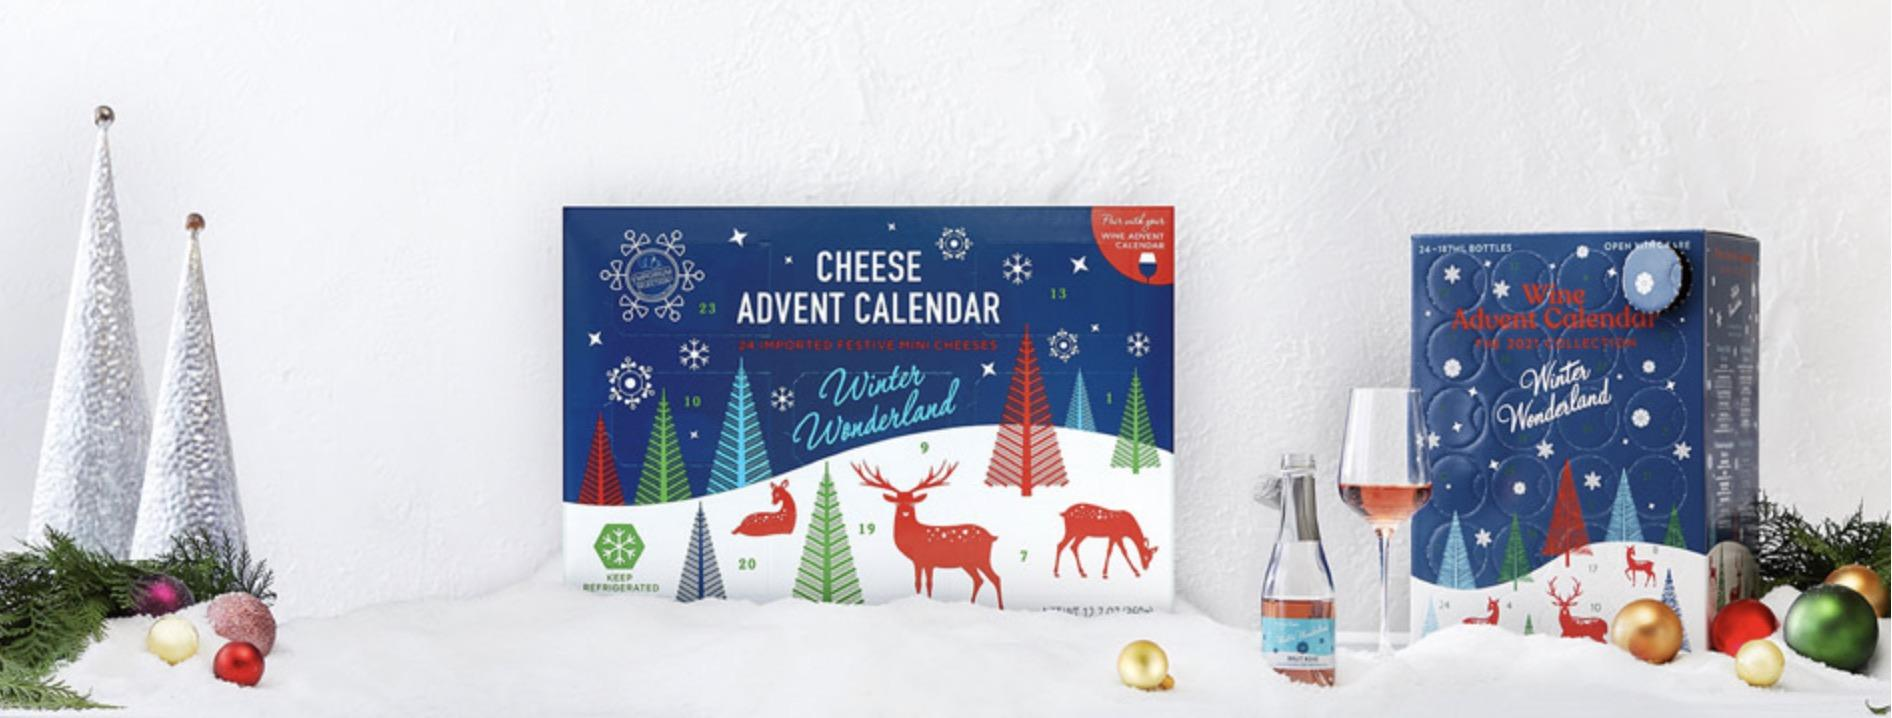 Aldi Wine Advent Calendars